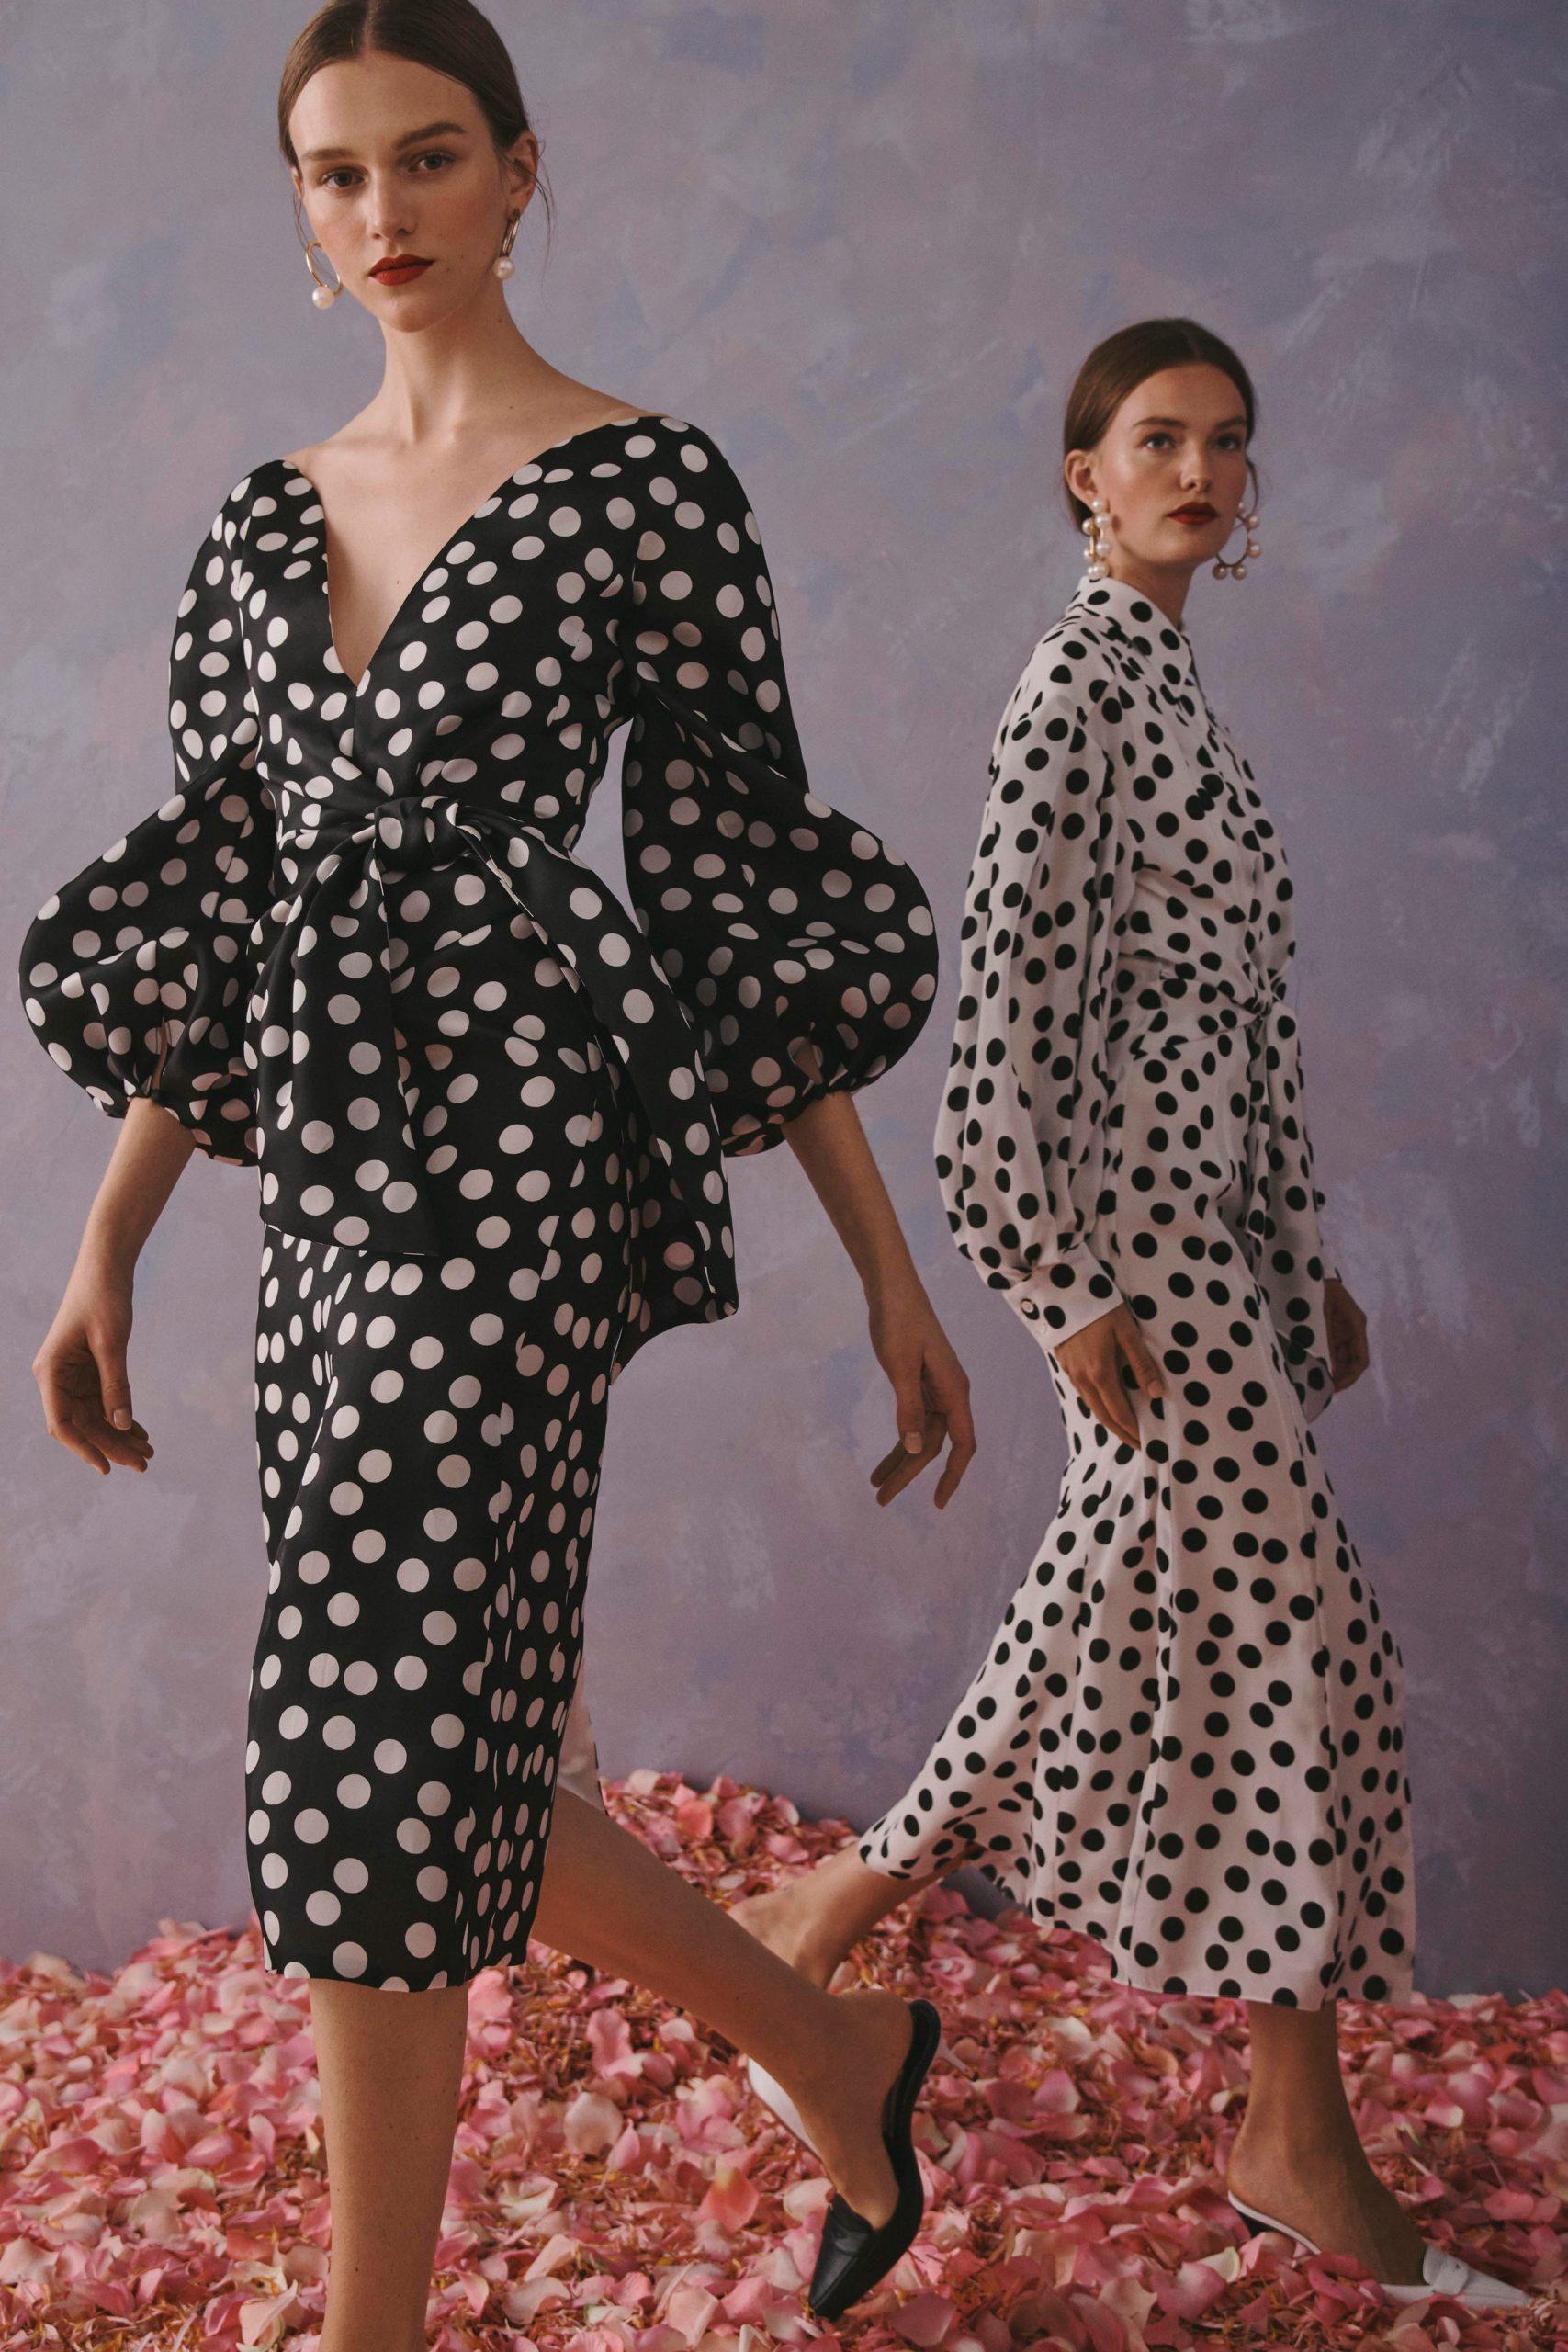 Trend Alert: Polka Dots 2020 | The Fashion Folks